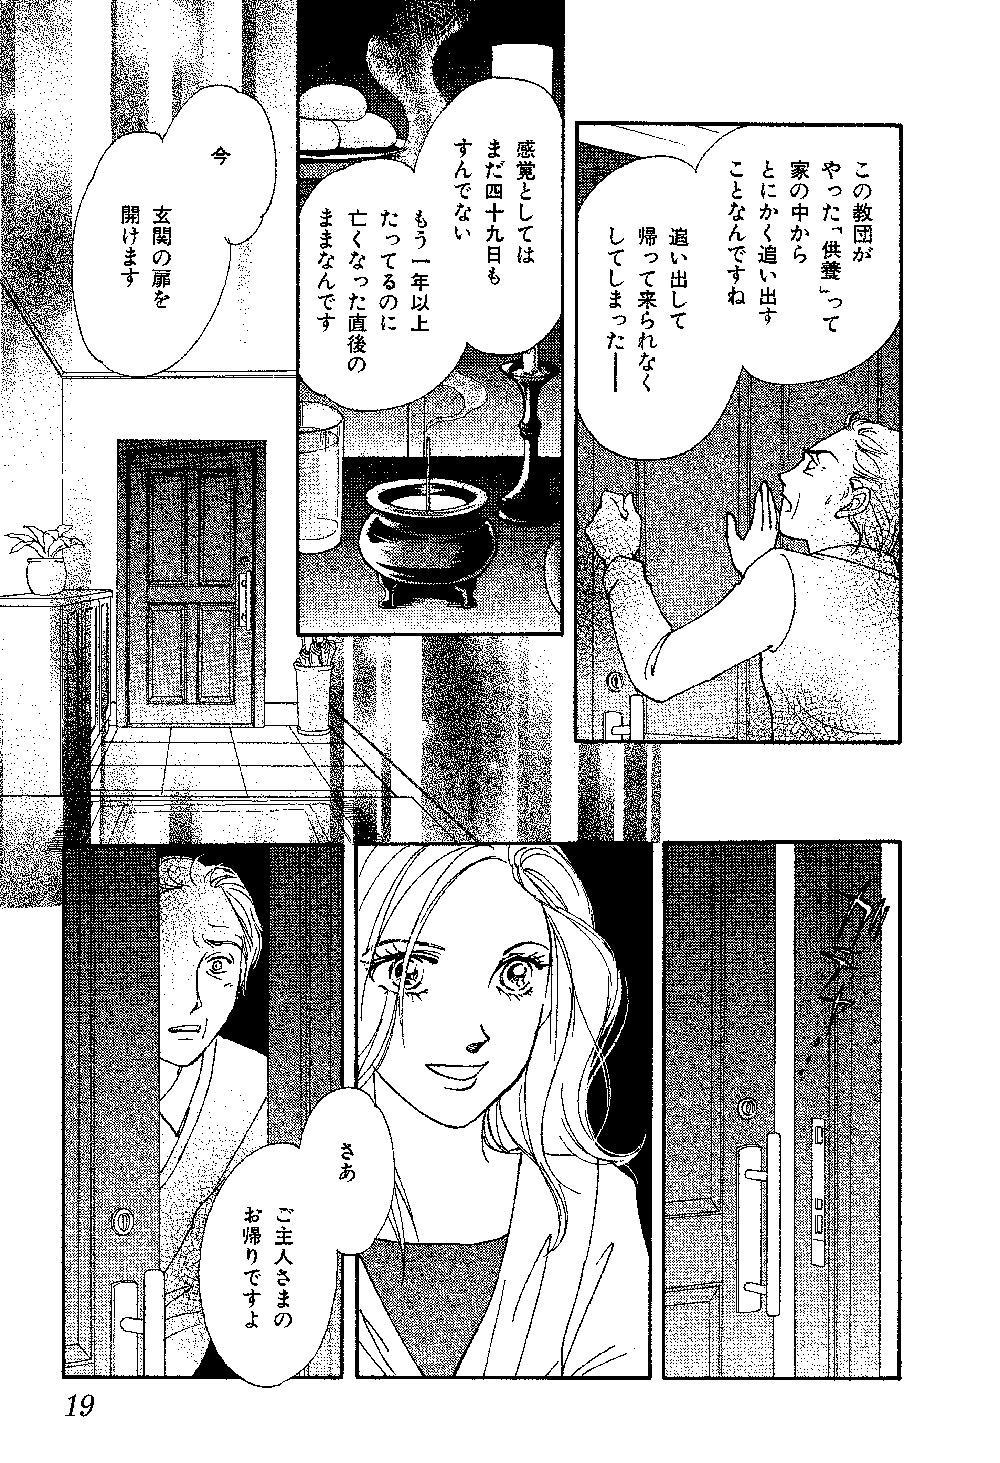 mayuri_0001_0019.jpg